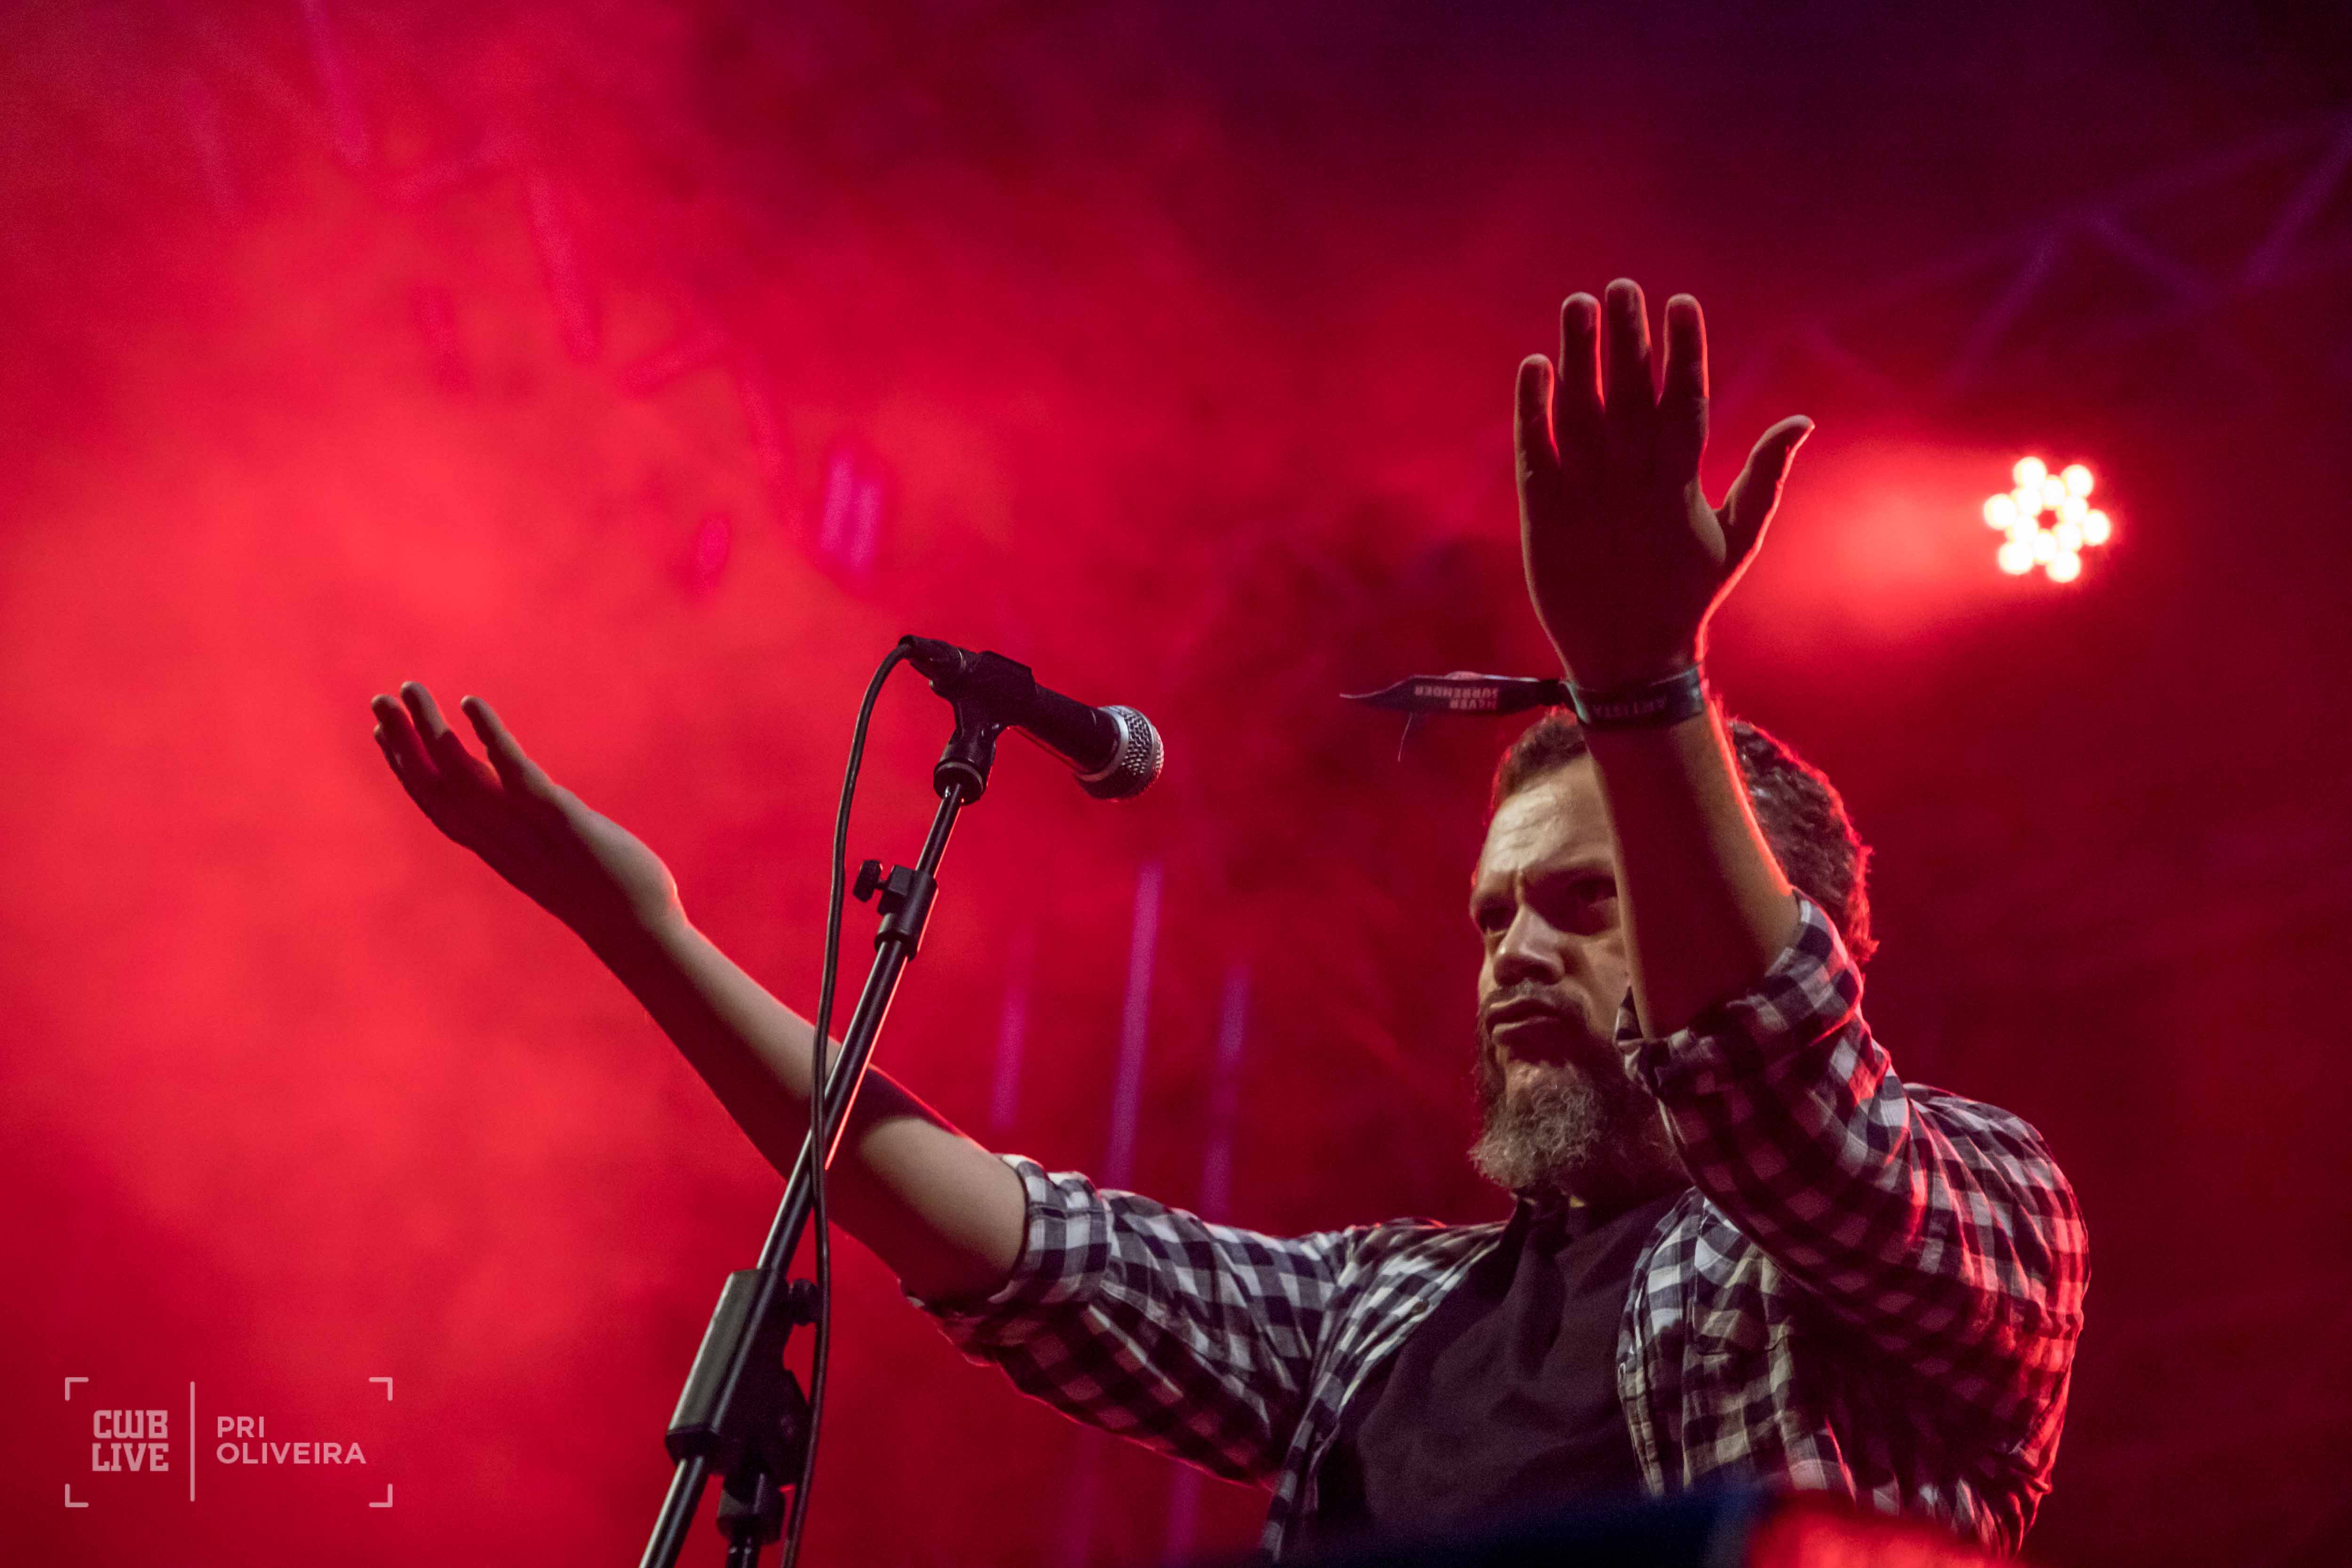 Matanza Inc - Festival Crossroads Dia Mundial do Rock - 13/07/2019